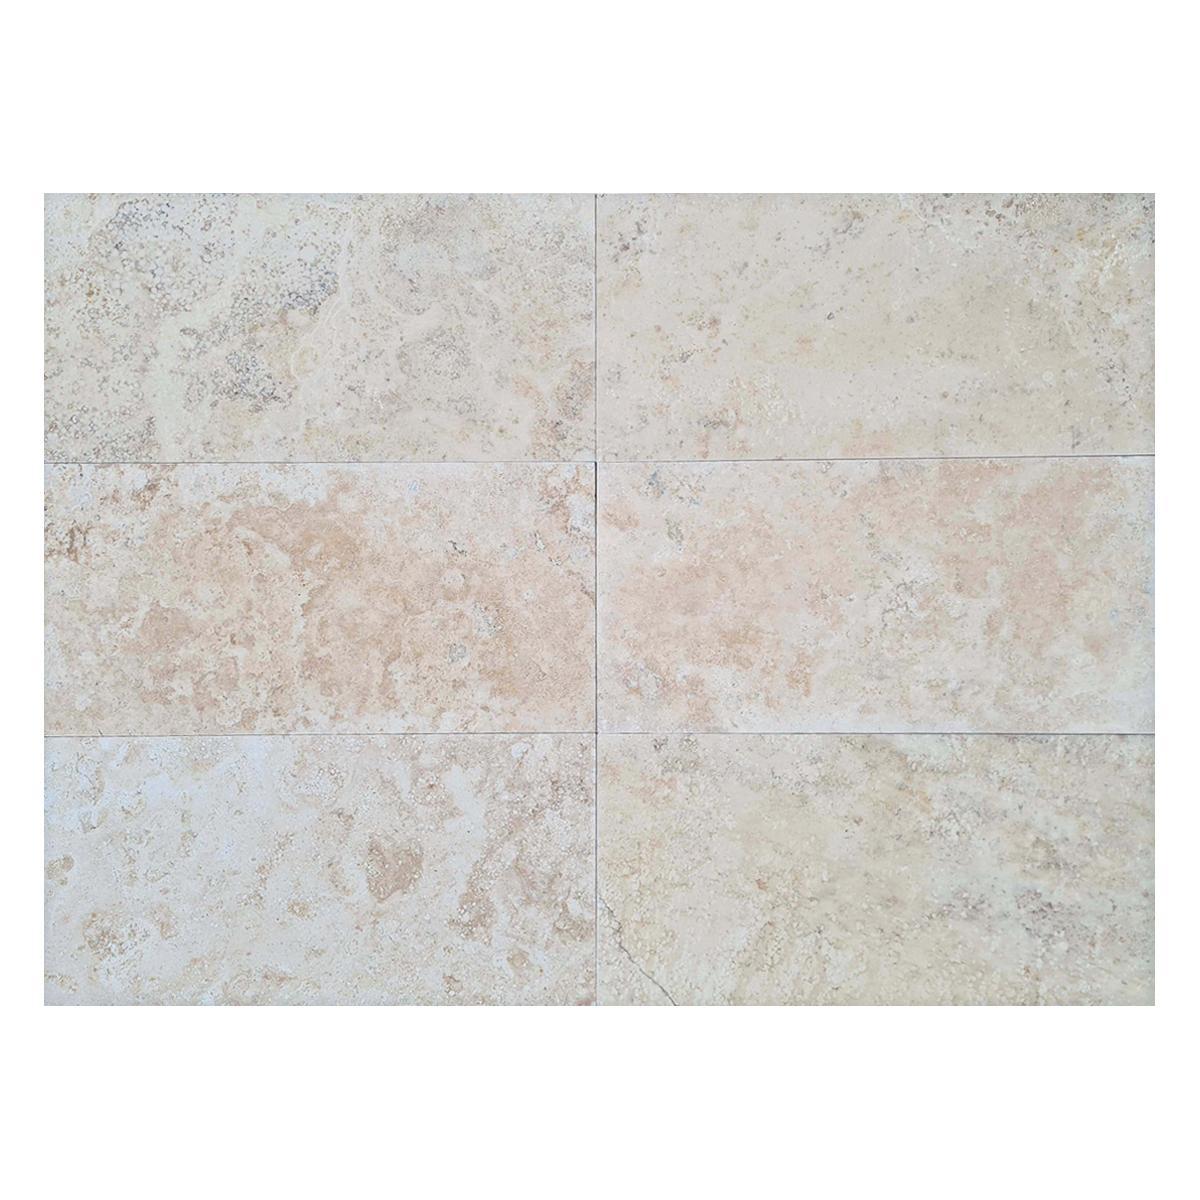 Mármol Travertino Paracas Crema Brillante - 30.5X60.9 cm - 1.11 m2